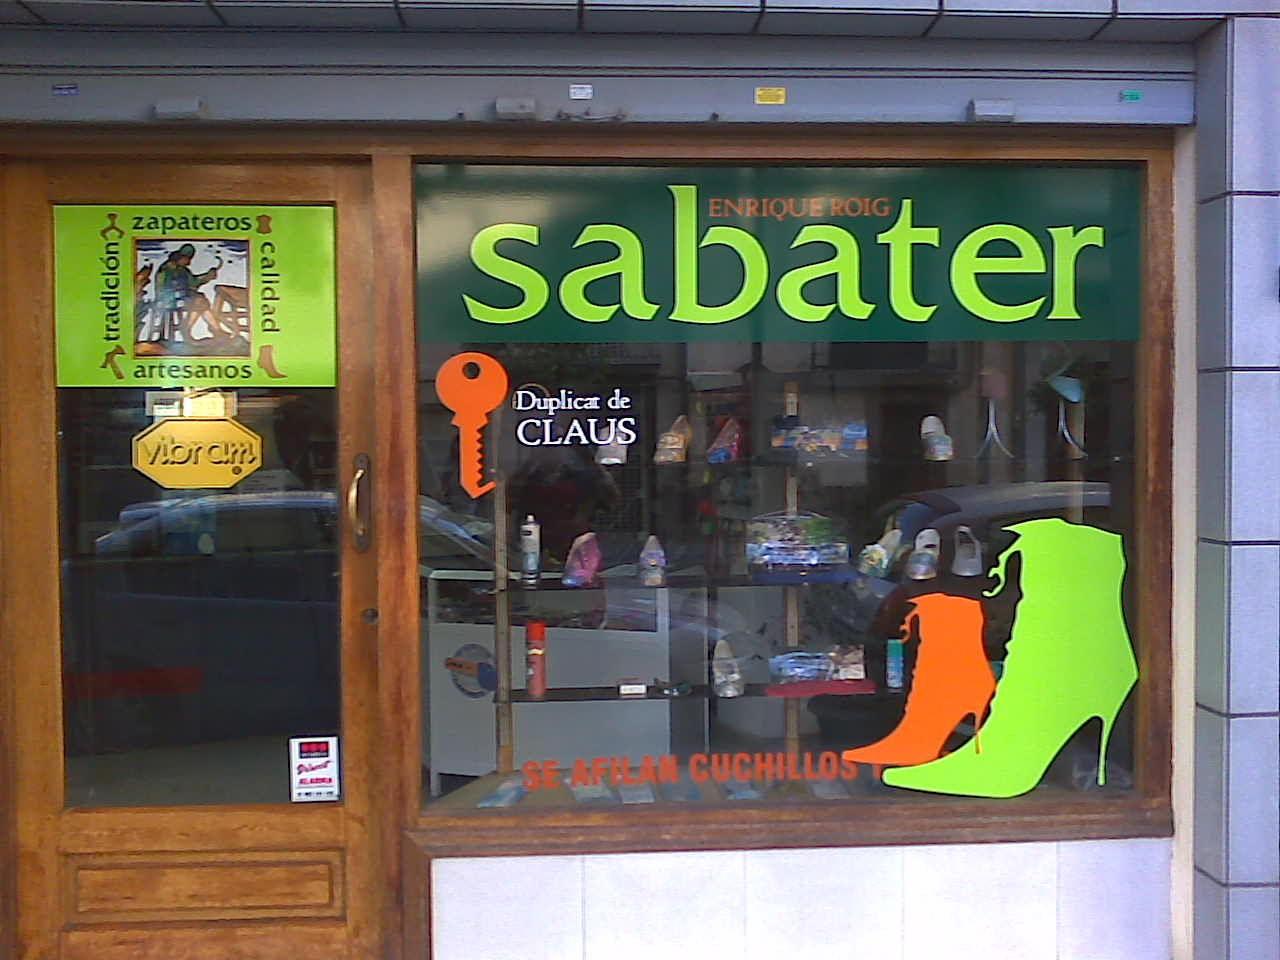 Foto 17 de Reparación de calzado en Castellón | Roig Vidal